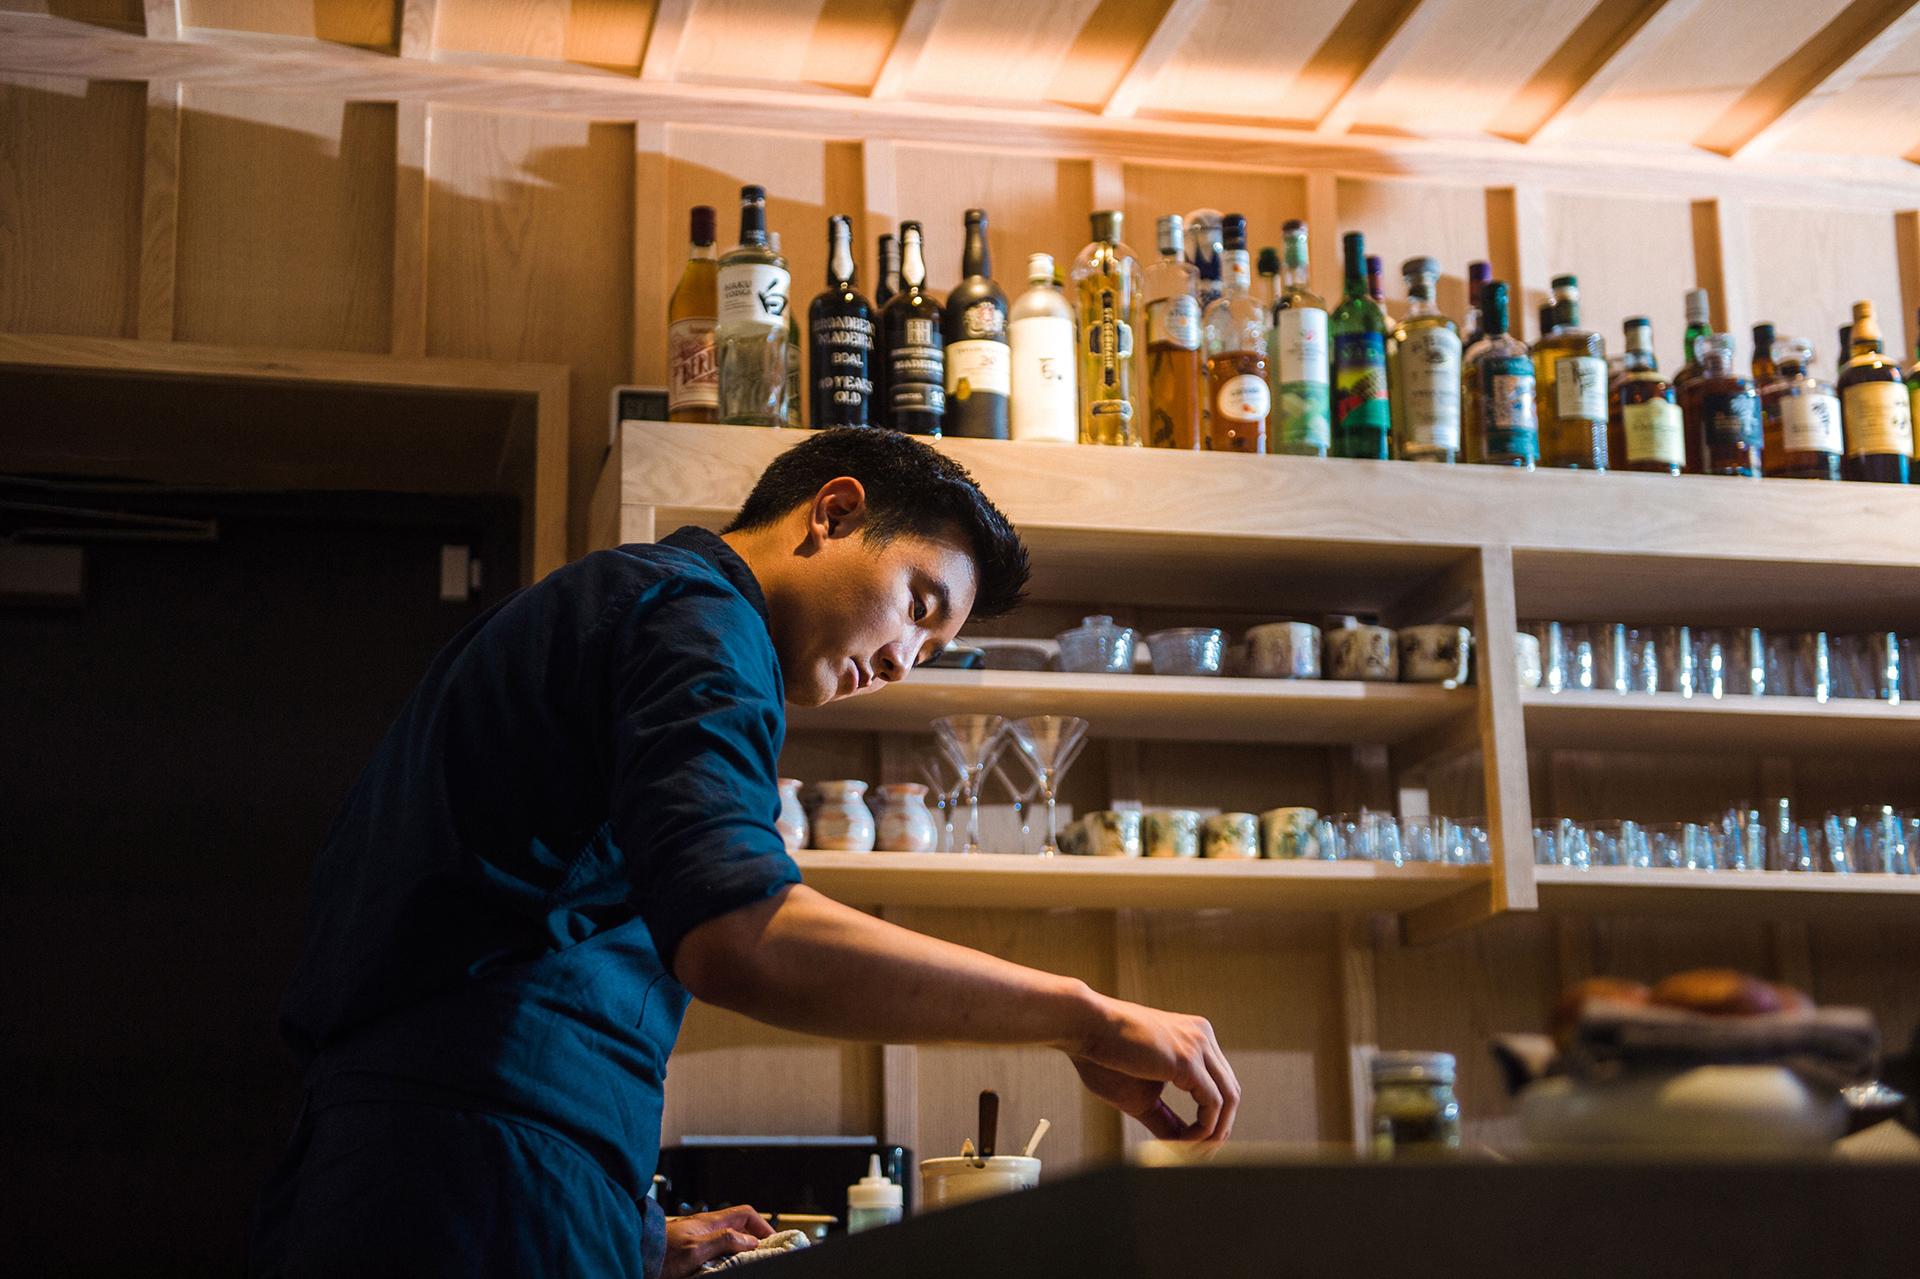 Head Chef Ki preparing a dish